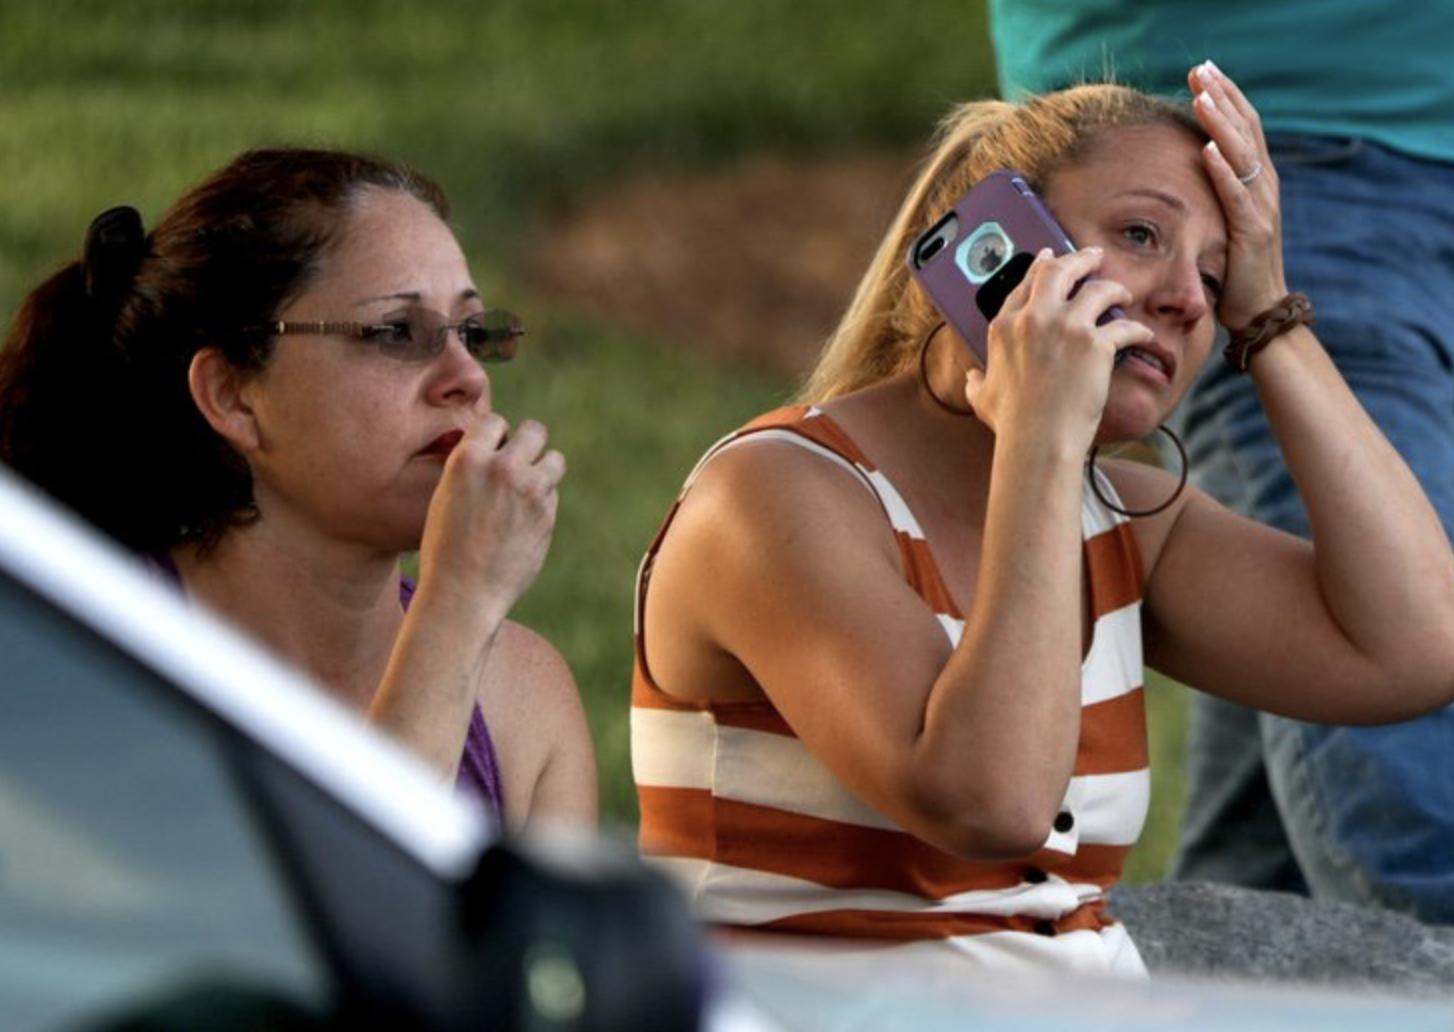 UNC Charlotte shootingLOGAN CYRUS/AFP/Getty Images